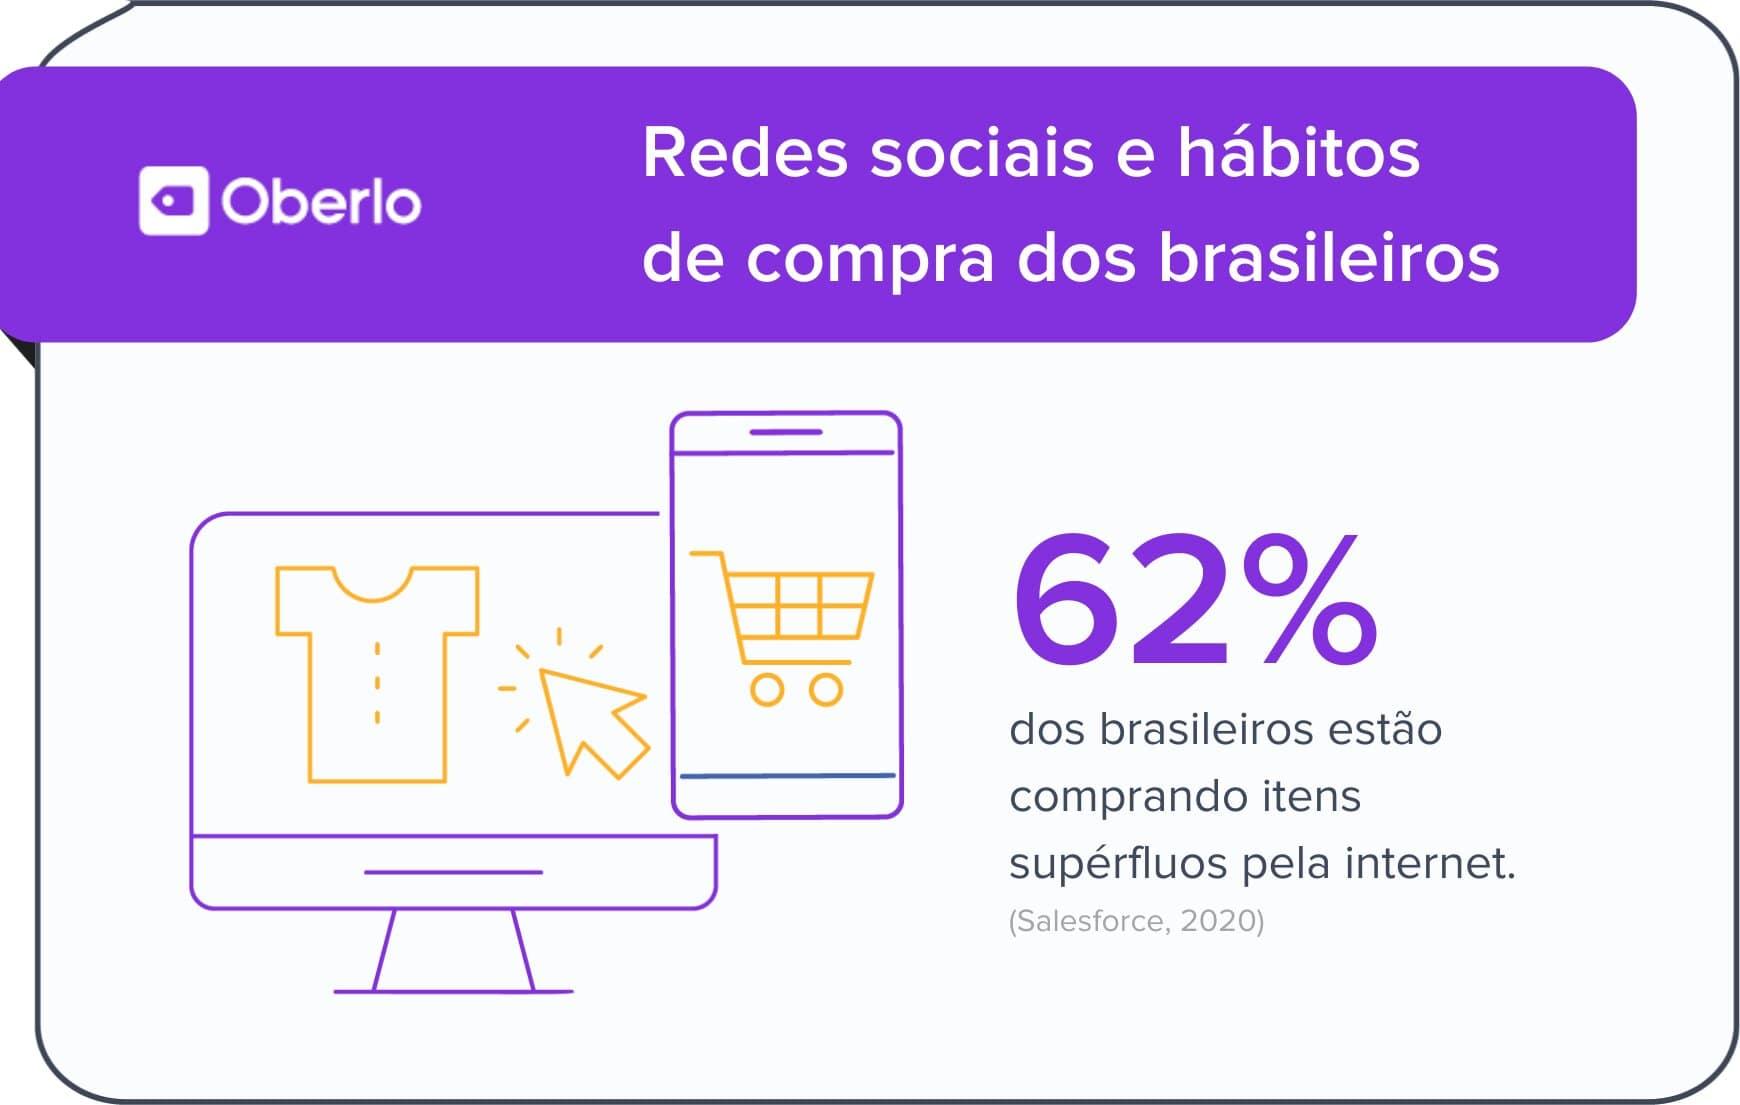 Redes sociais e hábitos de compra dos brasileiros